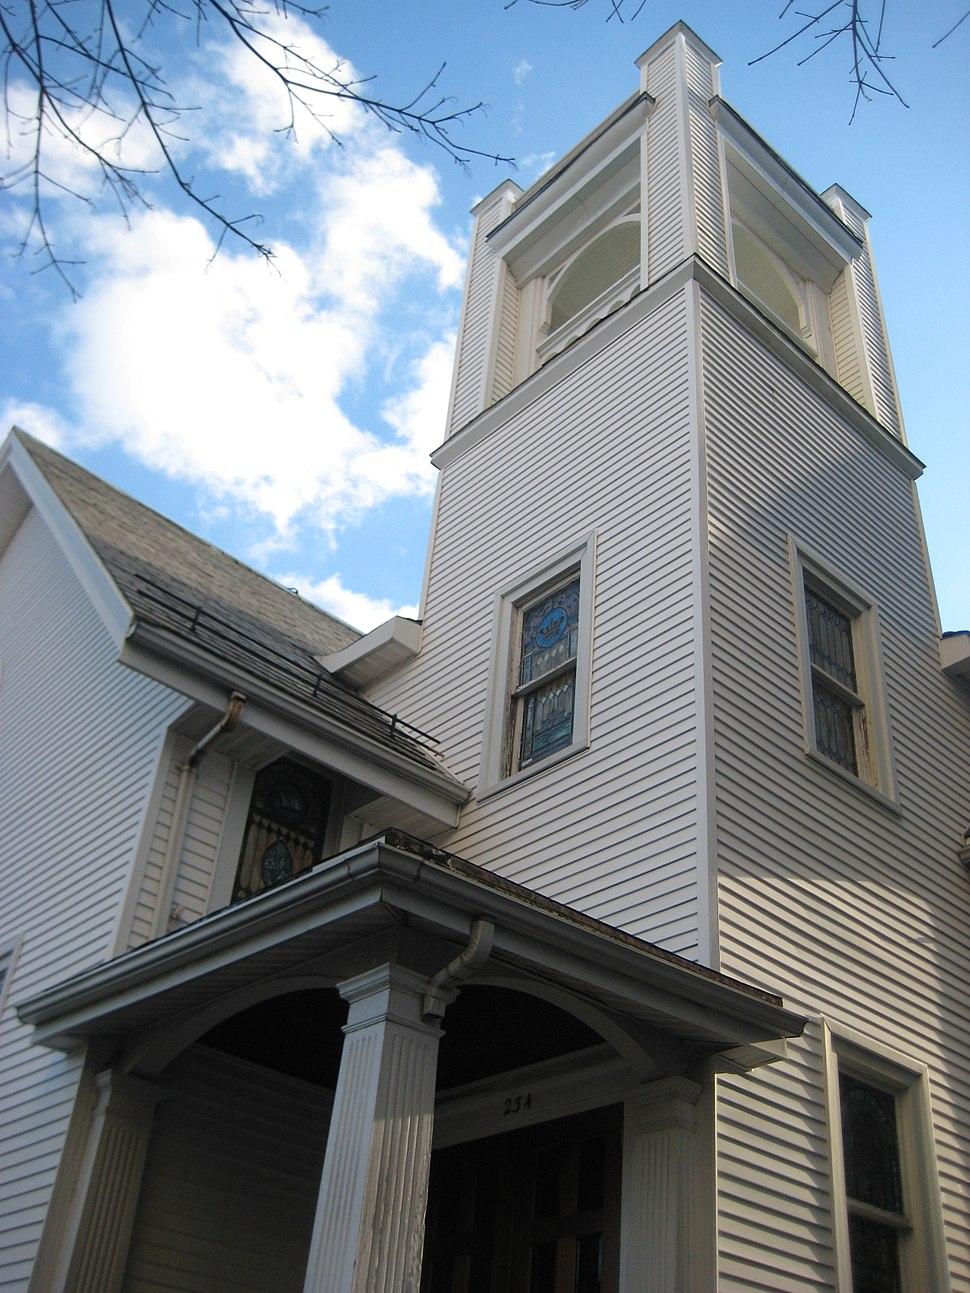 Church-of-the-Nazarene-Cambridge-MA-1